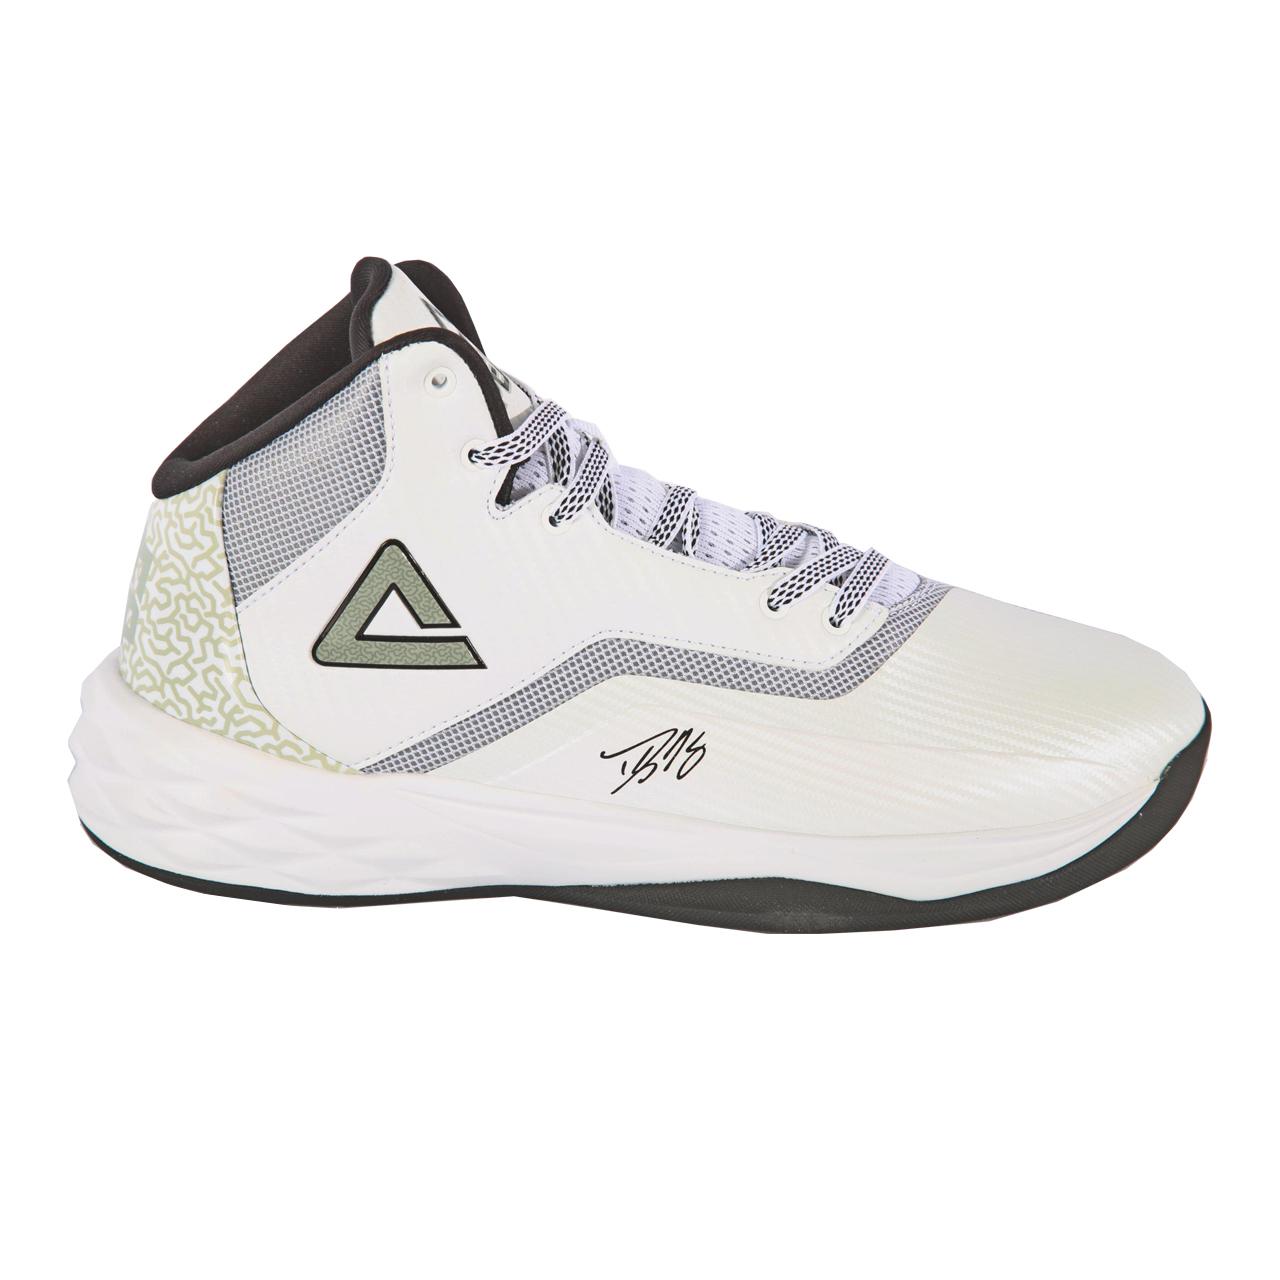 قیمت کفش بسکتبال مردانه پیک مدل  E81007A